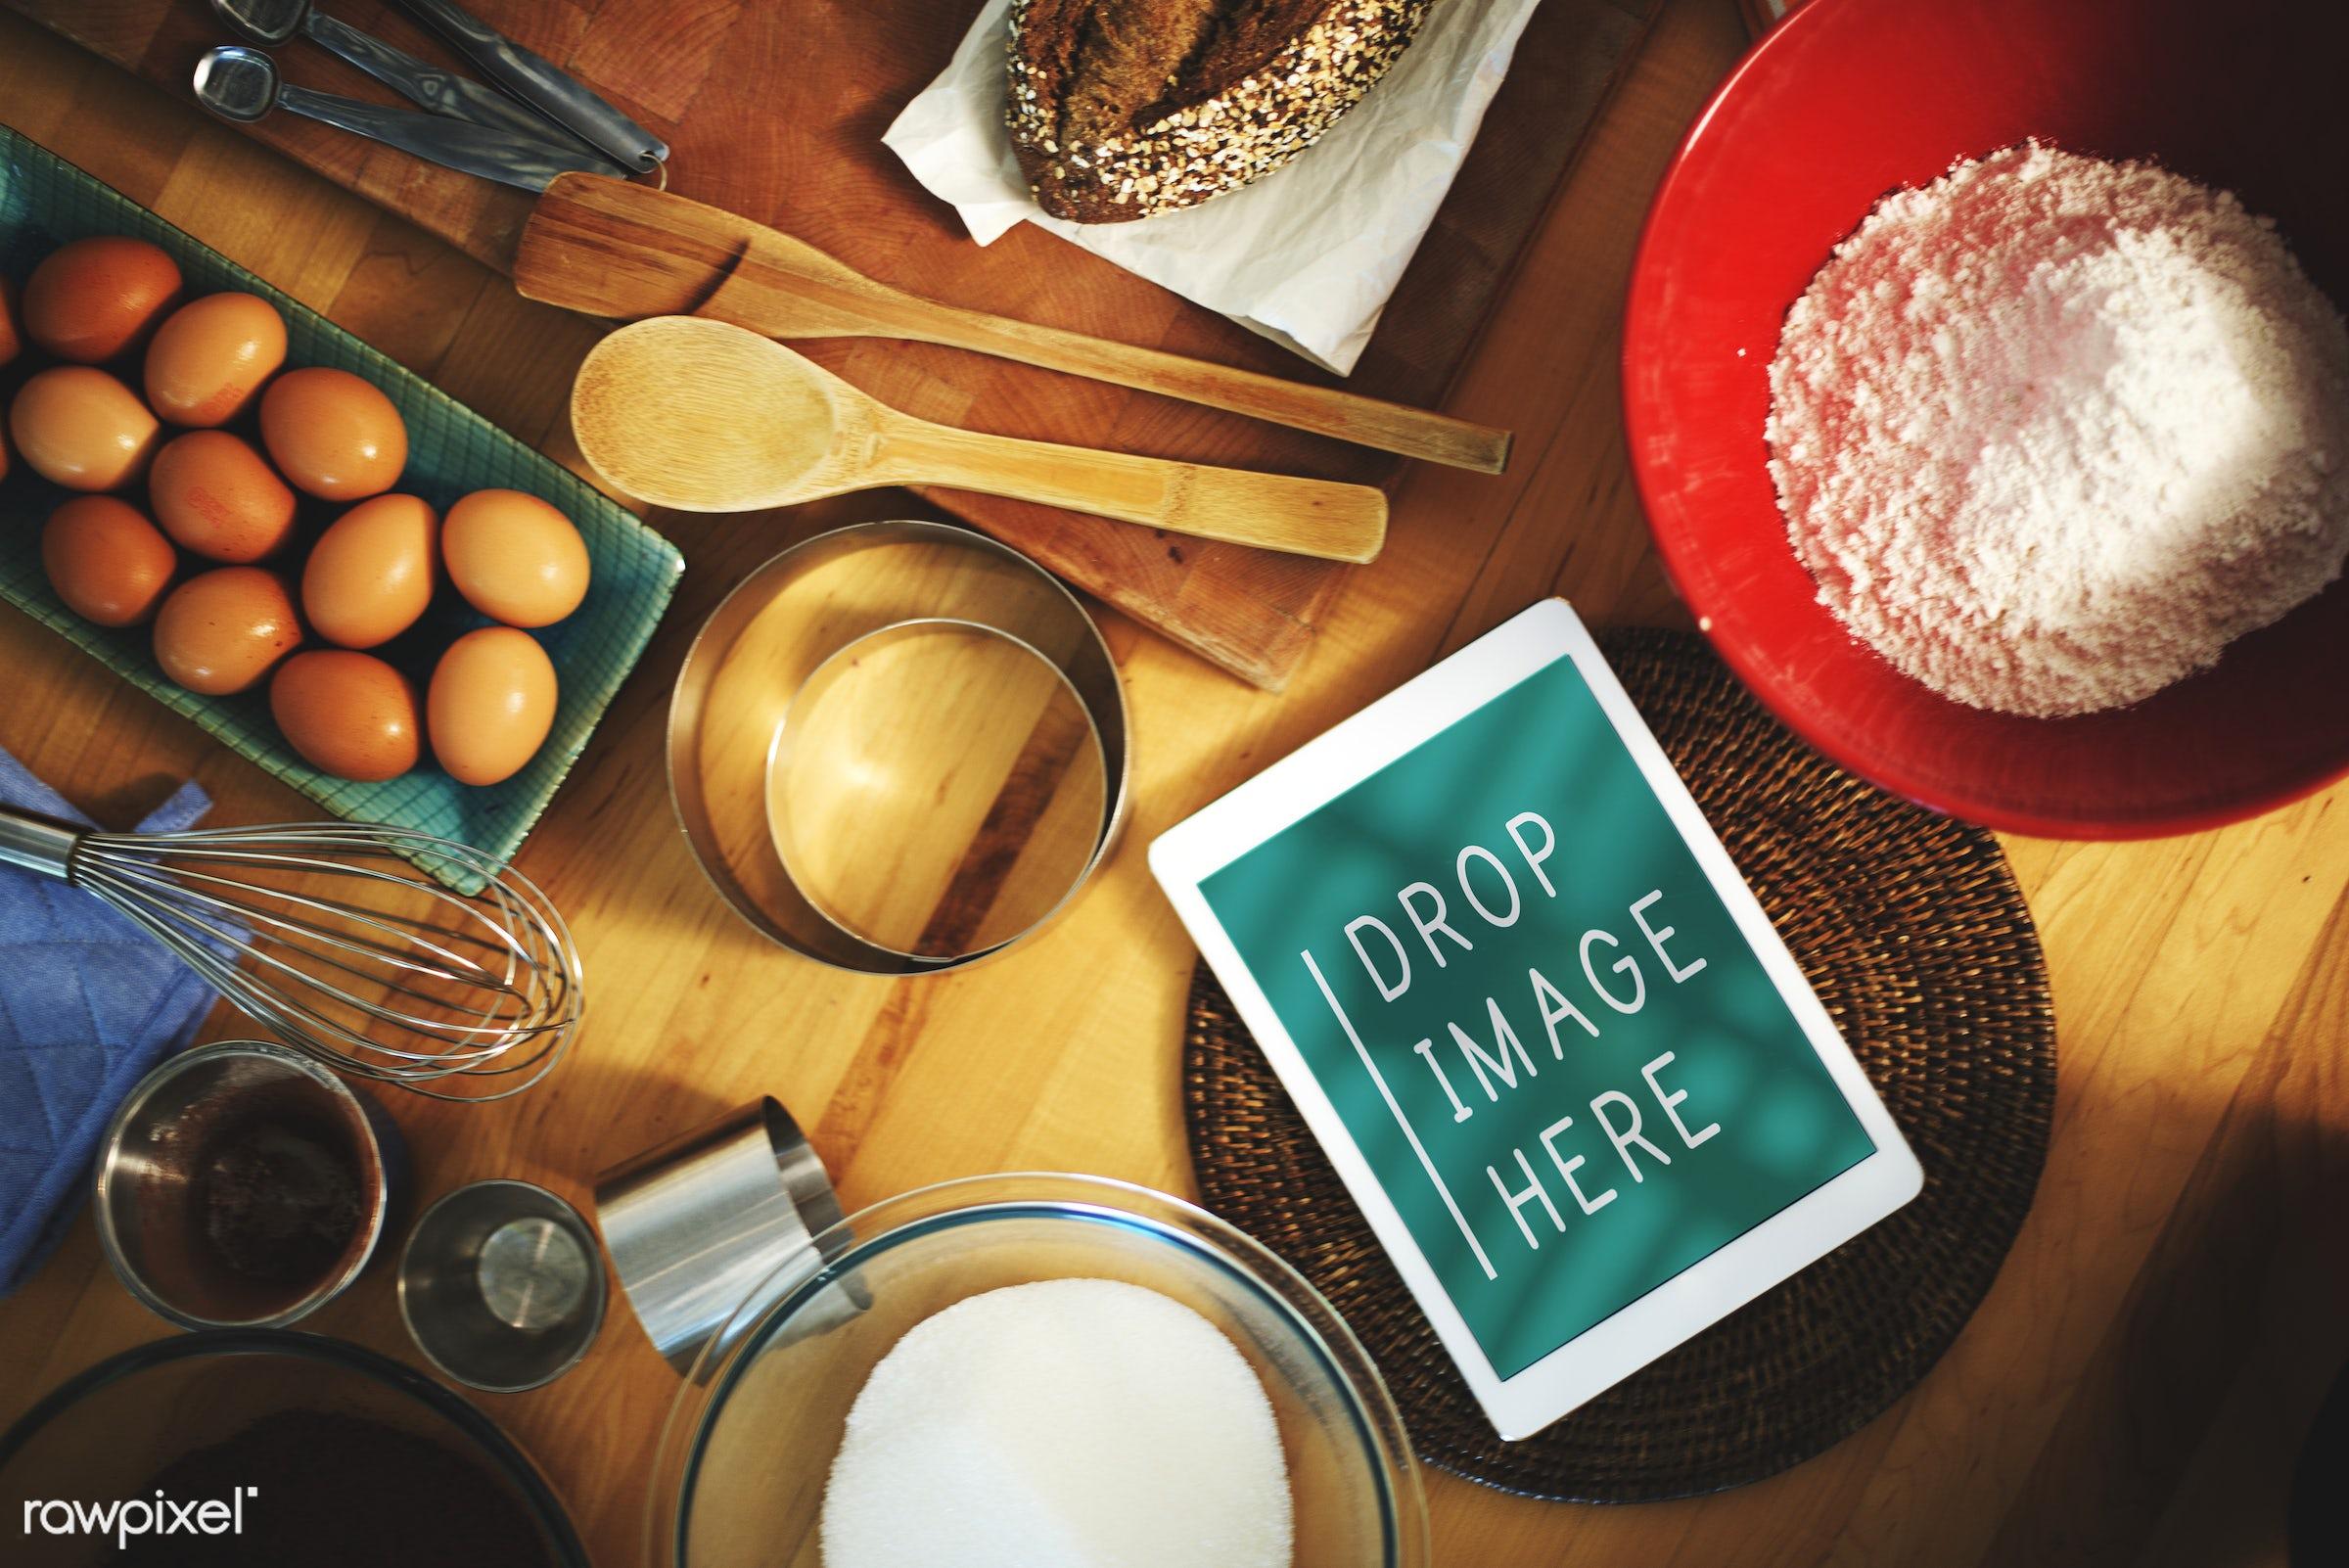 bake, bake shop, bakery, baking, cook, cookies, cooking, cutlery, delicious, eggs, equipment, food, gourmet, hobby,...